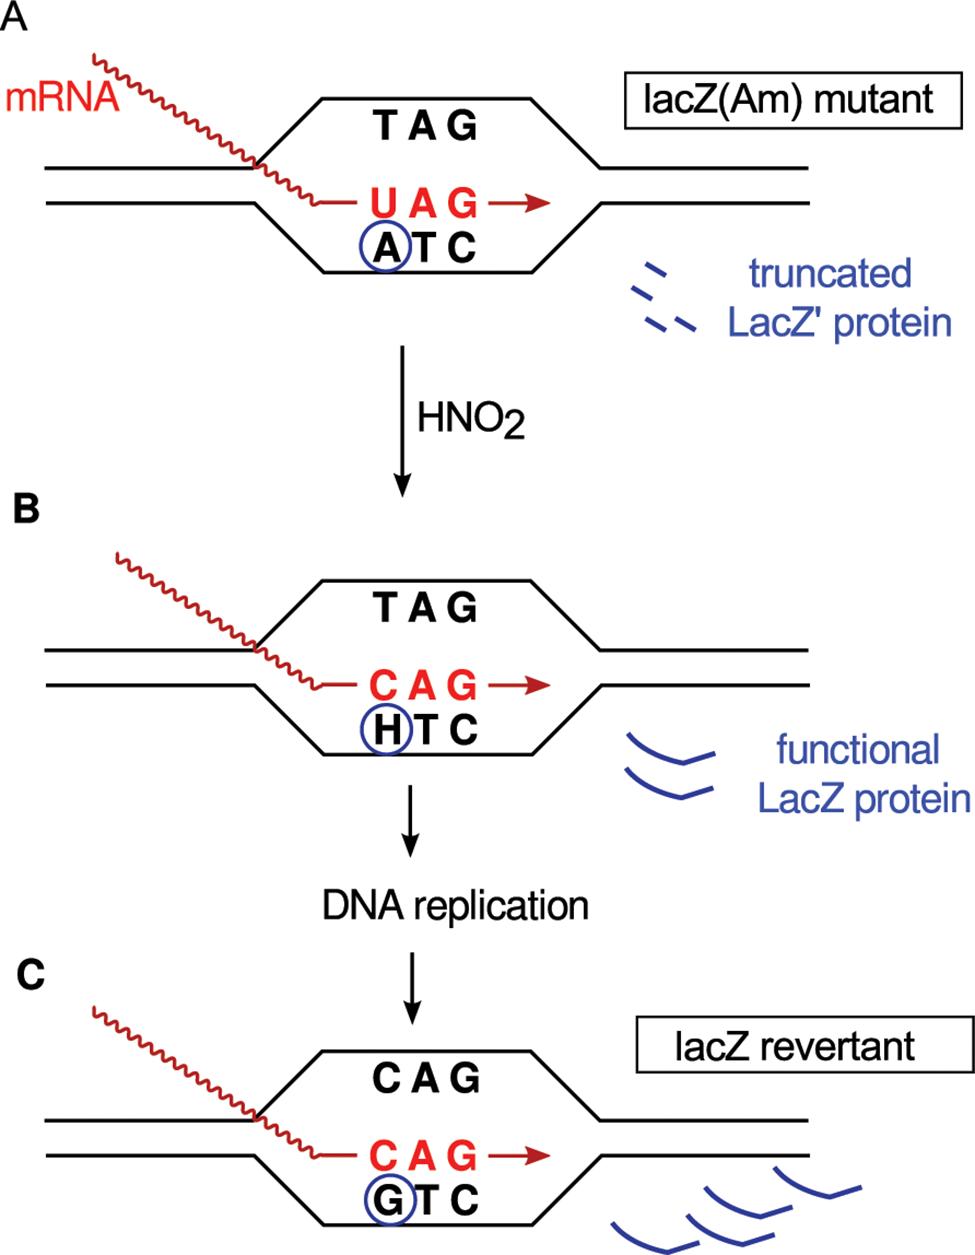 Example of retromutagenesis.